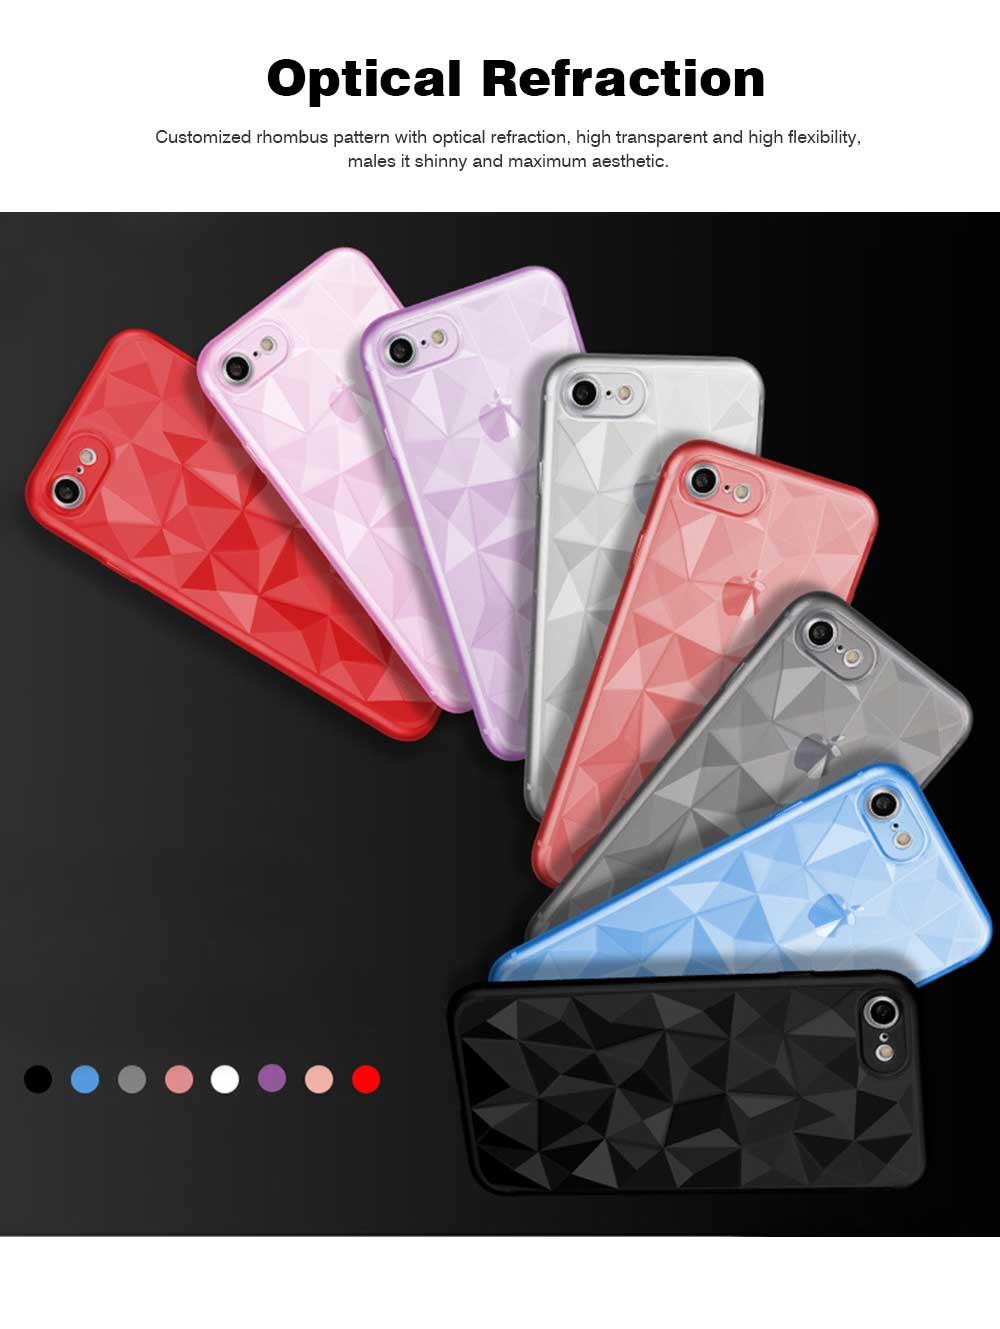 4.7-6.5 inch Soft Phone Case for iPhone Samsung Huawei, Rhombus TPU Phone Cover, Transparent Rhombus Pattern Phone Case 8